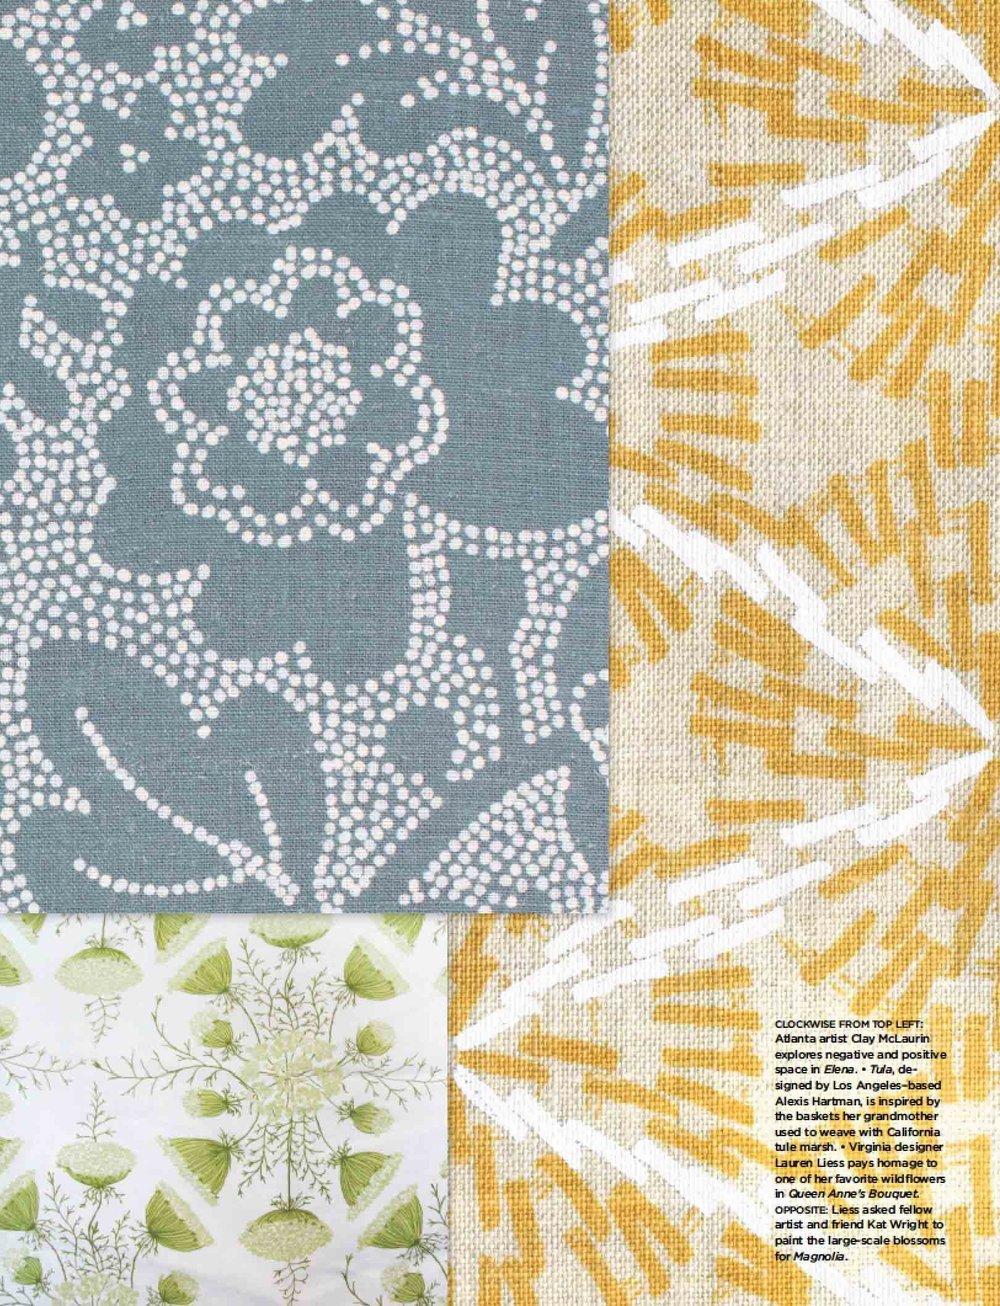 ClayMcLaurinStudio_Flower_Magazine_1_web.jpg